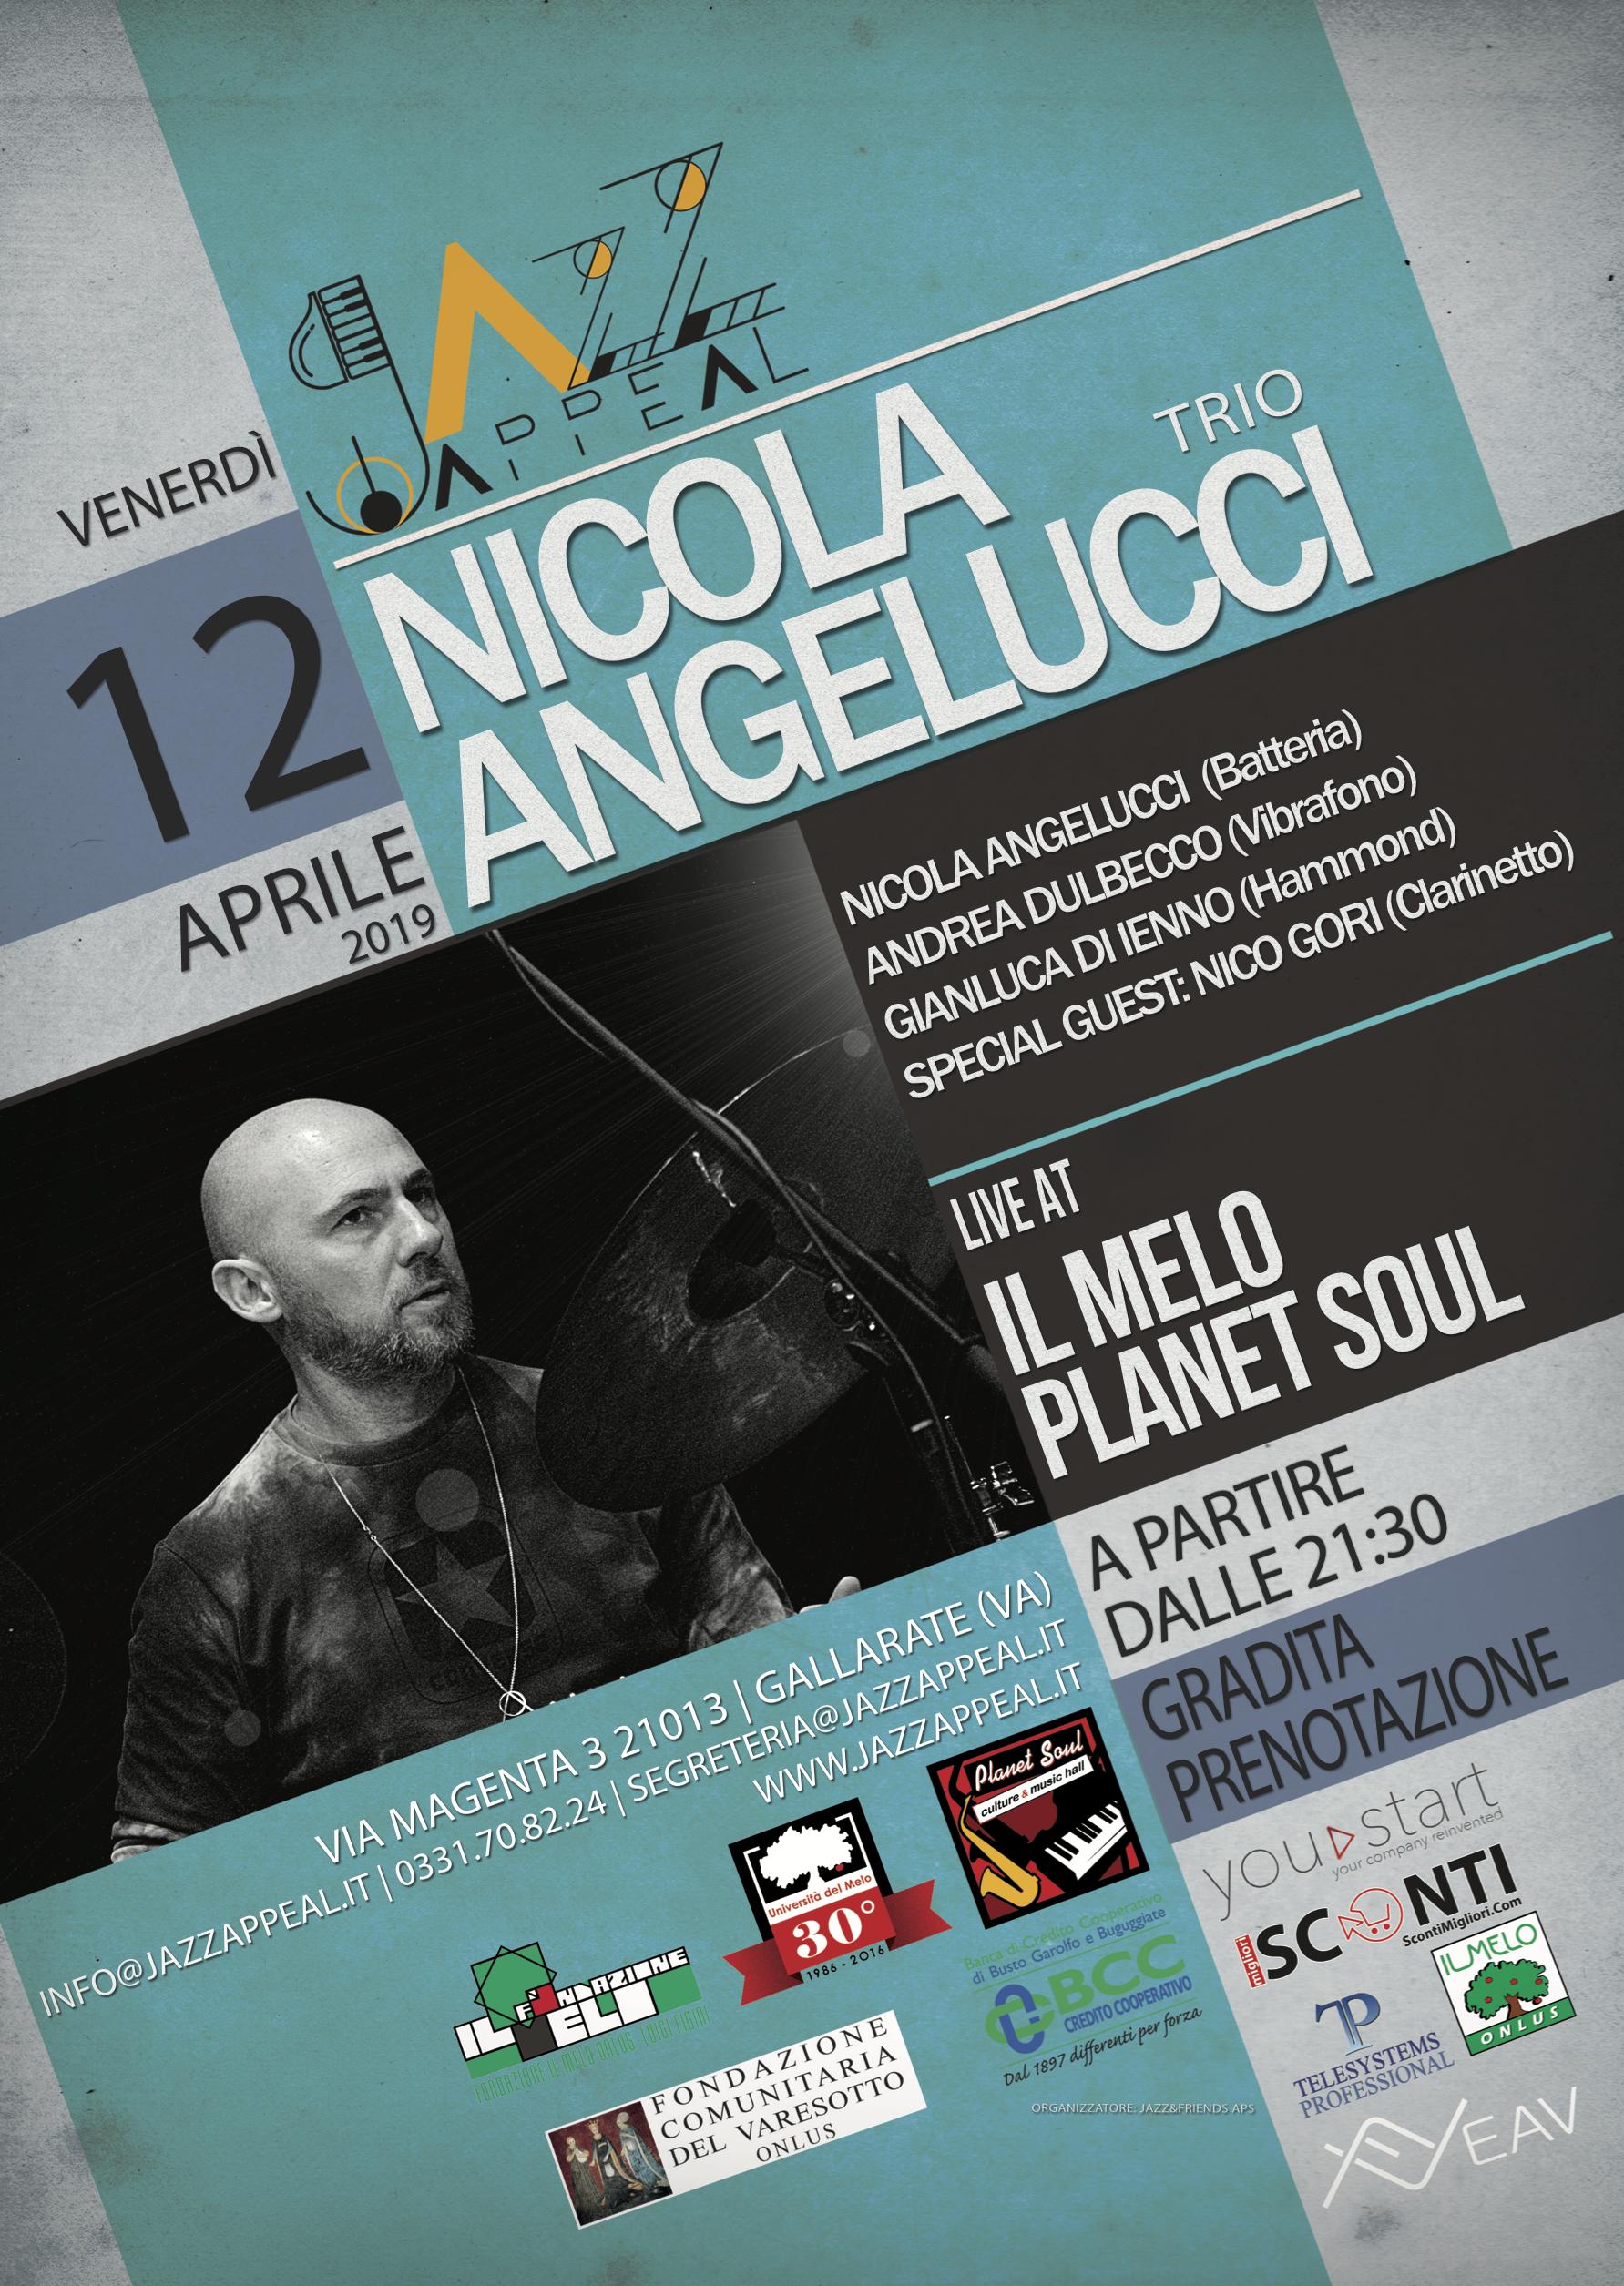 Nicola Angelucci Jazz Appeal